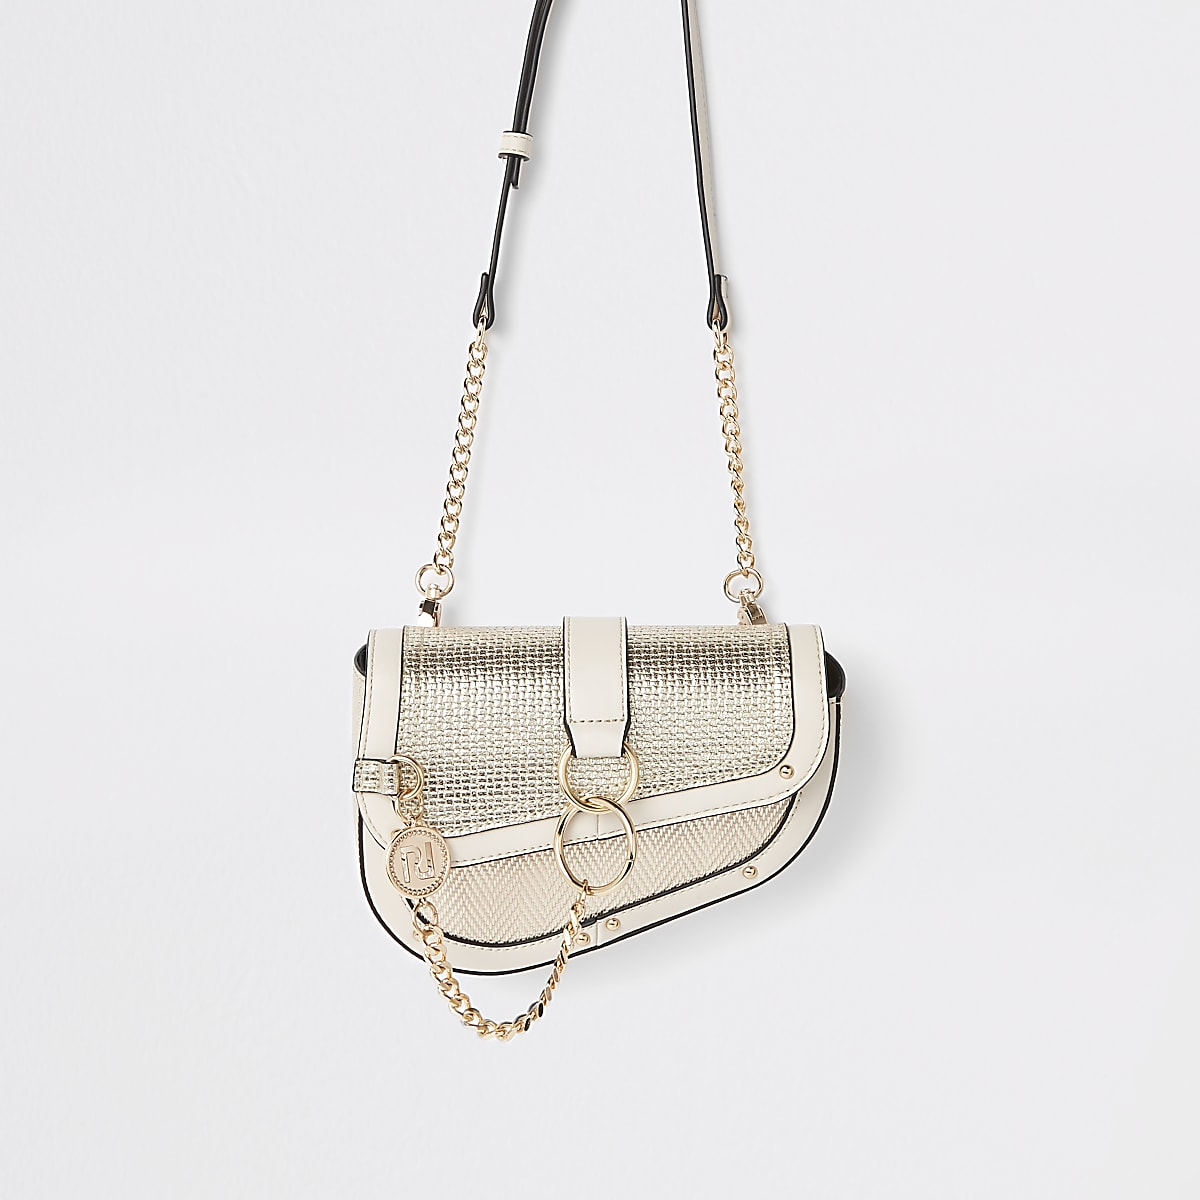 Metallic Saddle Hoop Chain Bag Gold yYbfIg6v7